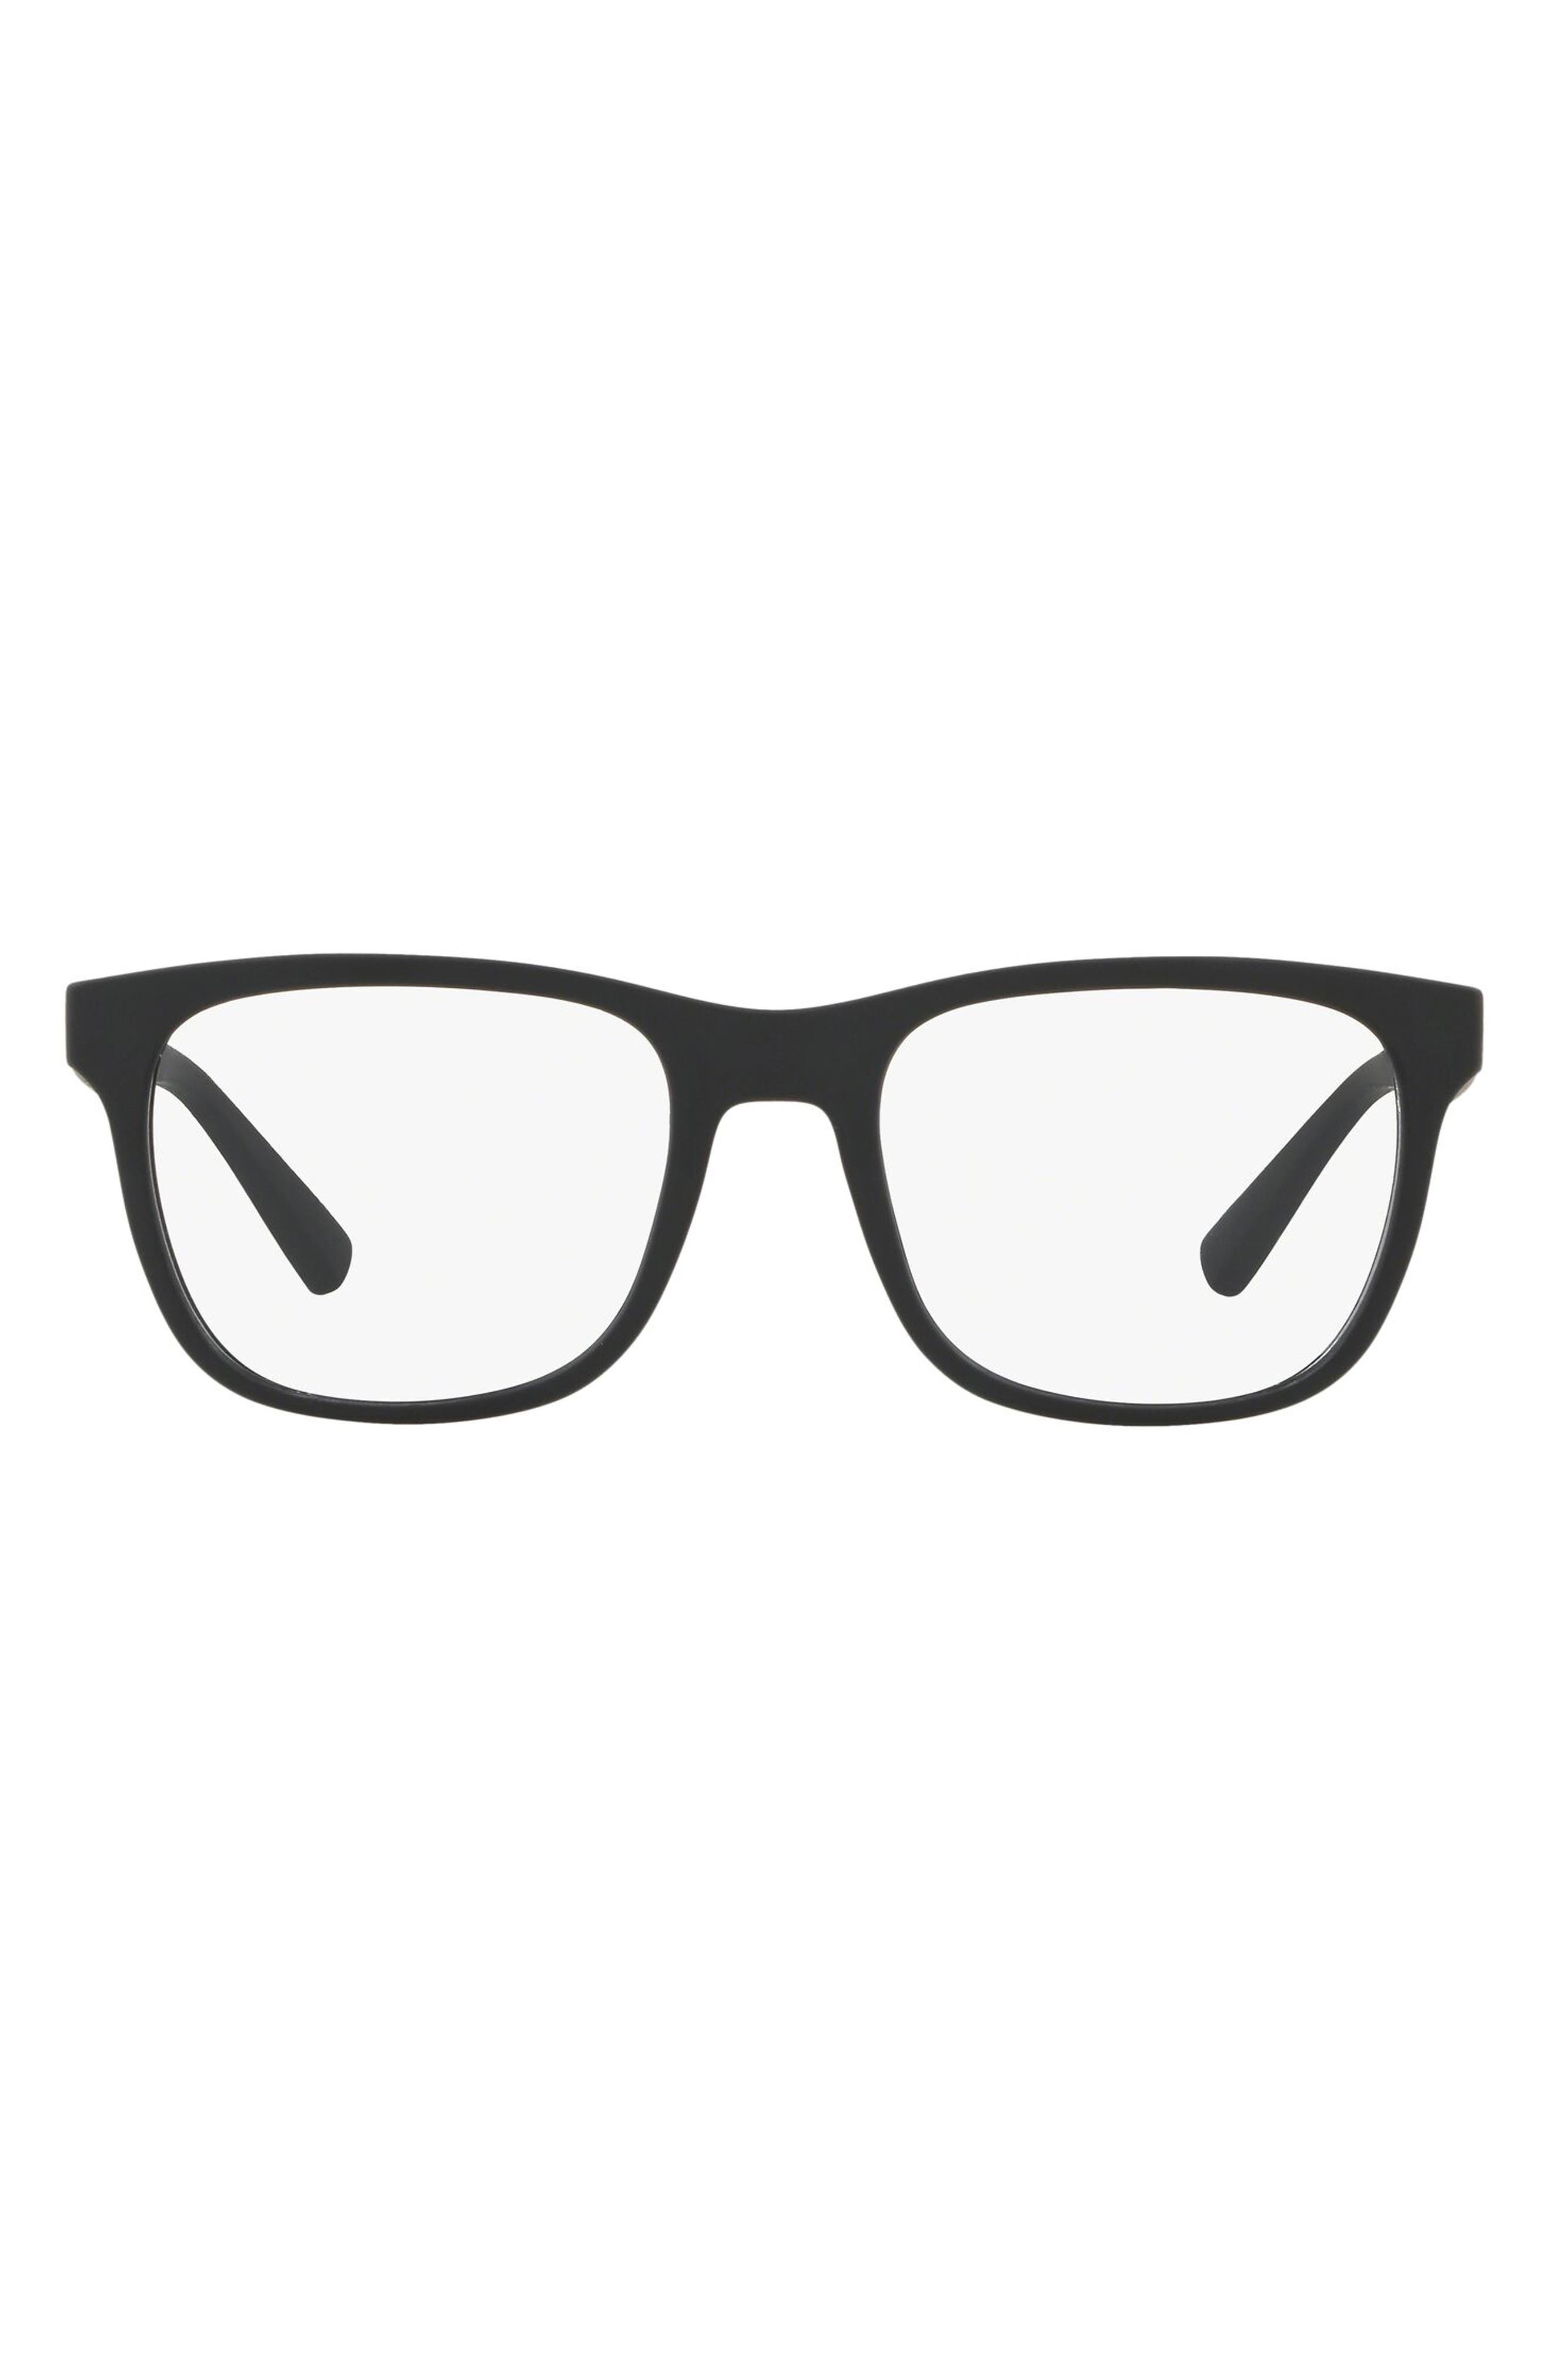 53mm Square Optical Glasses